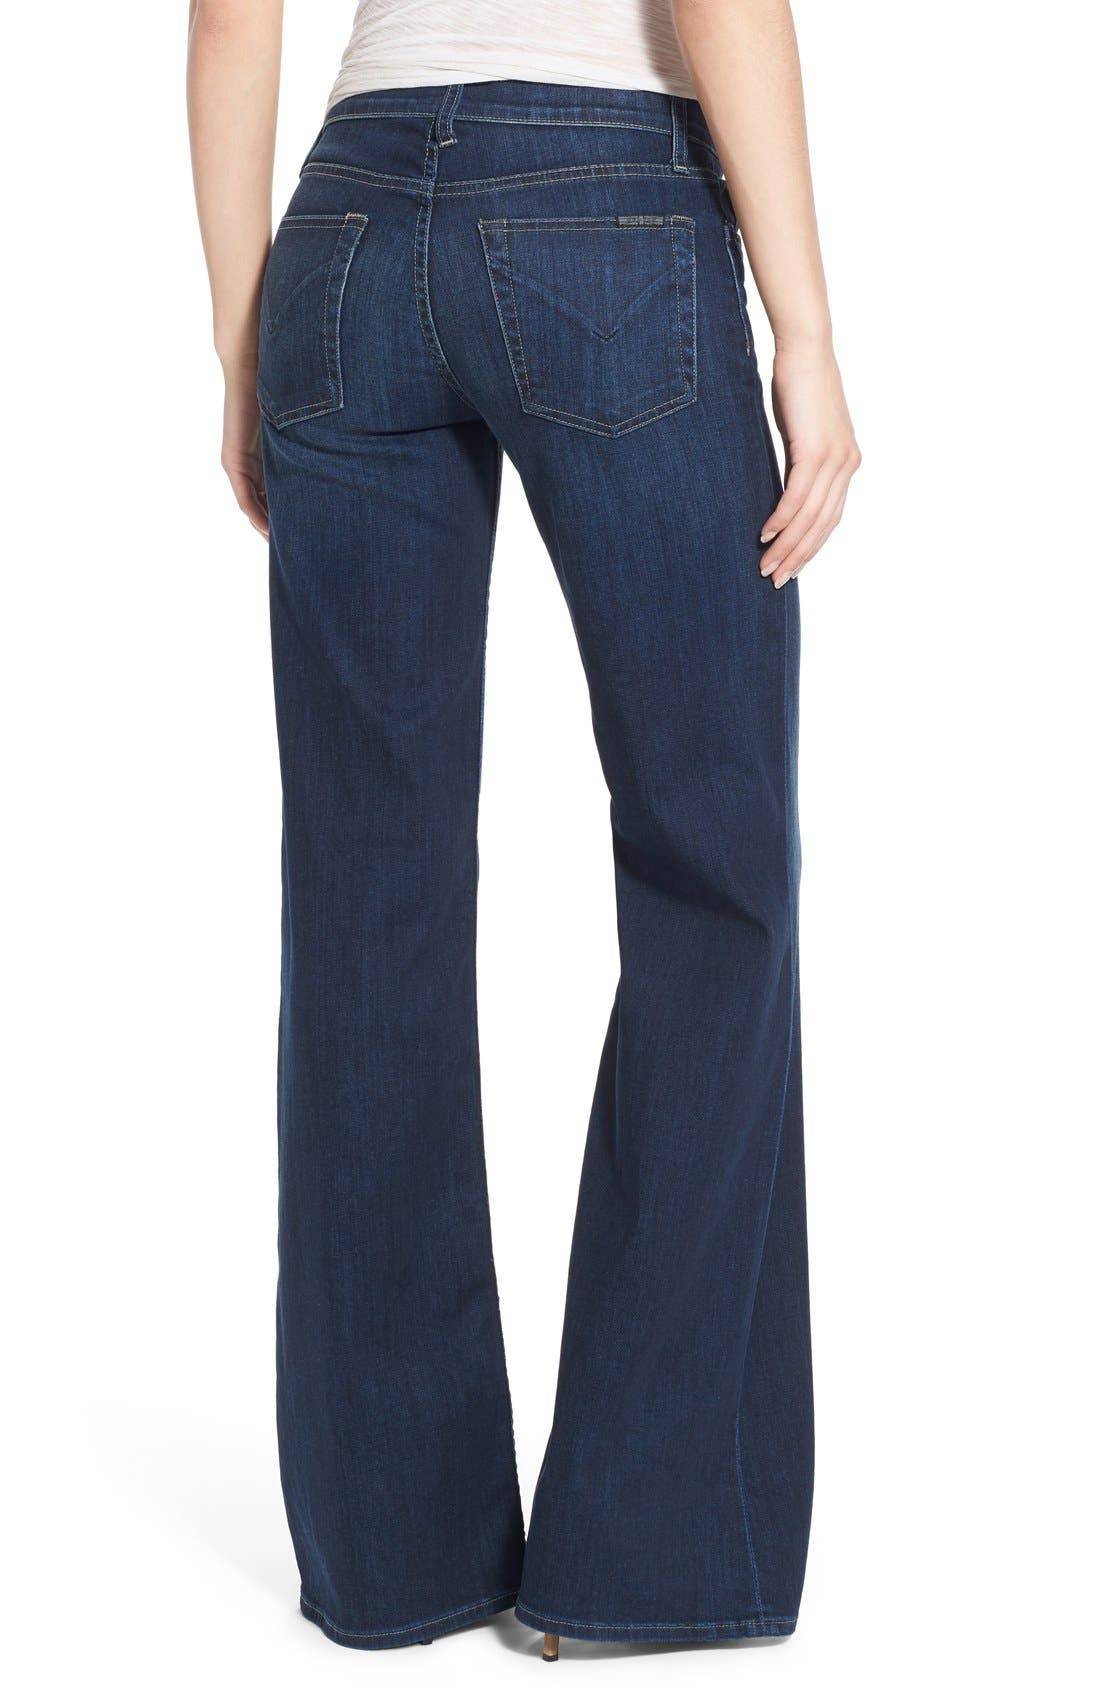 Alternate Image 2  - Hudson Jeans Piper Wide Leg Jeans (Thruway)